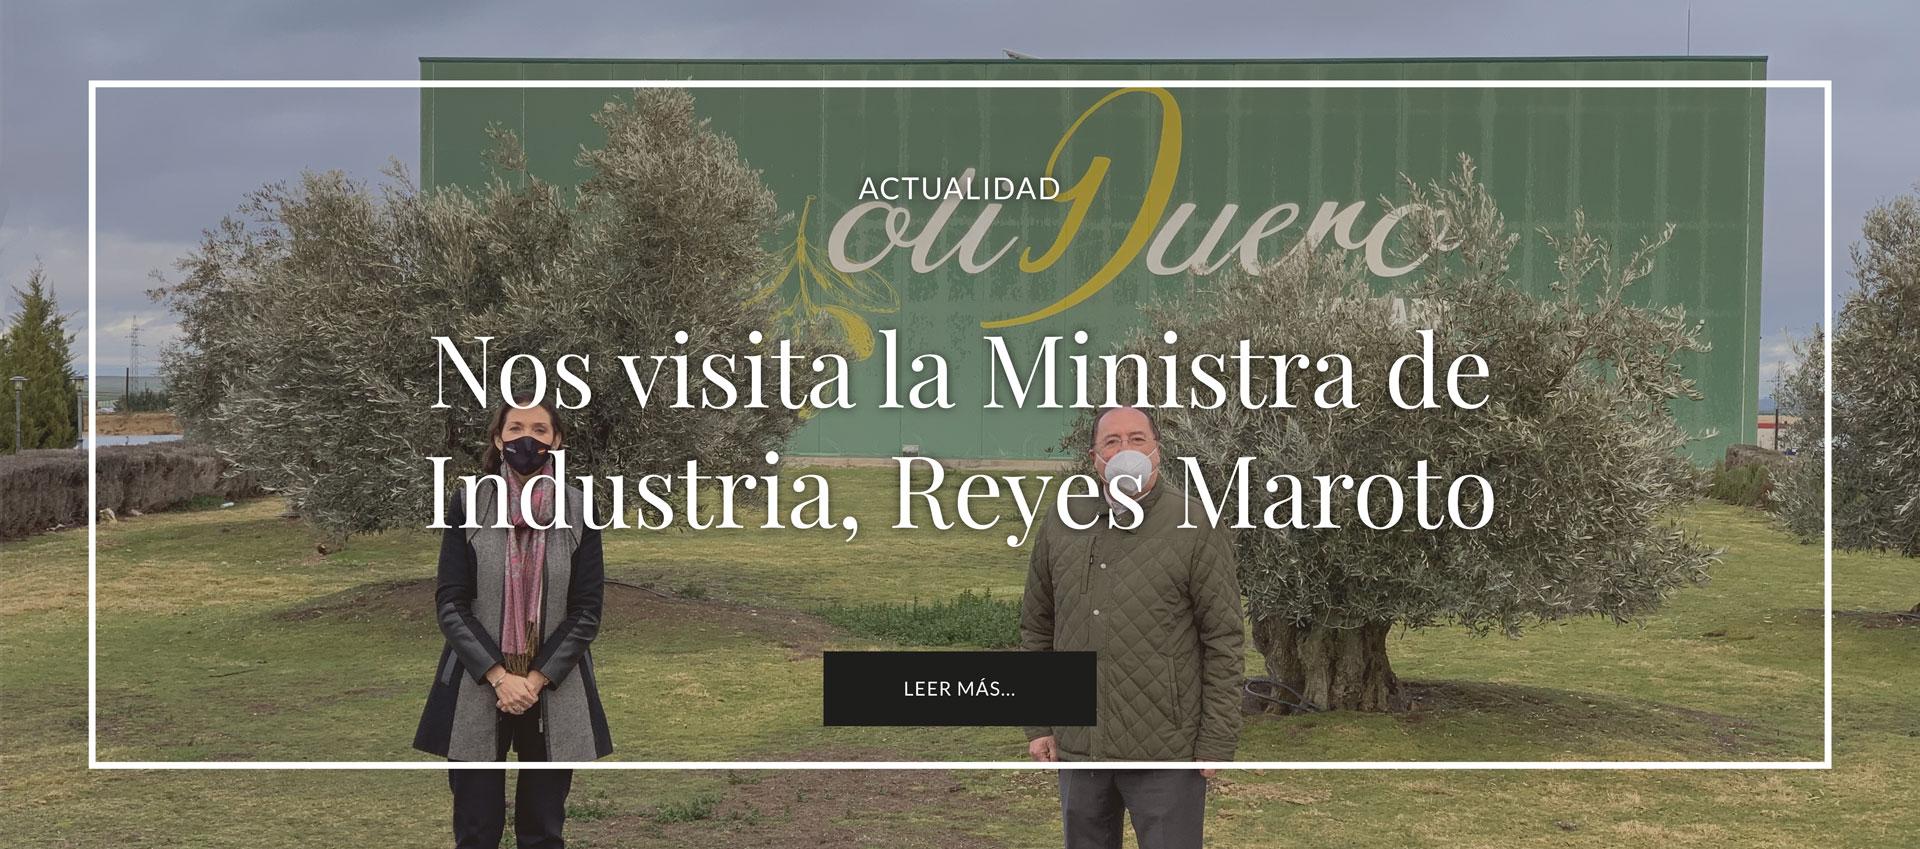 visita-ministra-industria-reyes-maroto-en-emina-rueda-almazara-oliduero